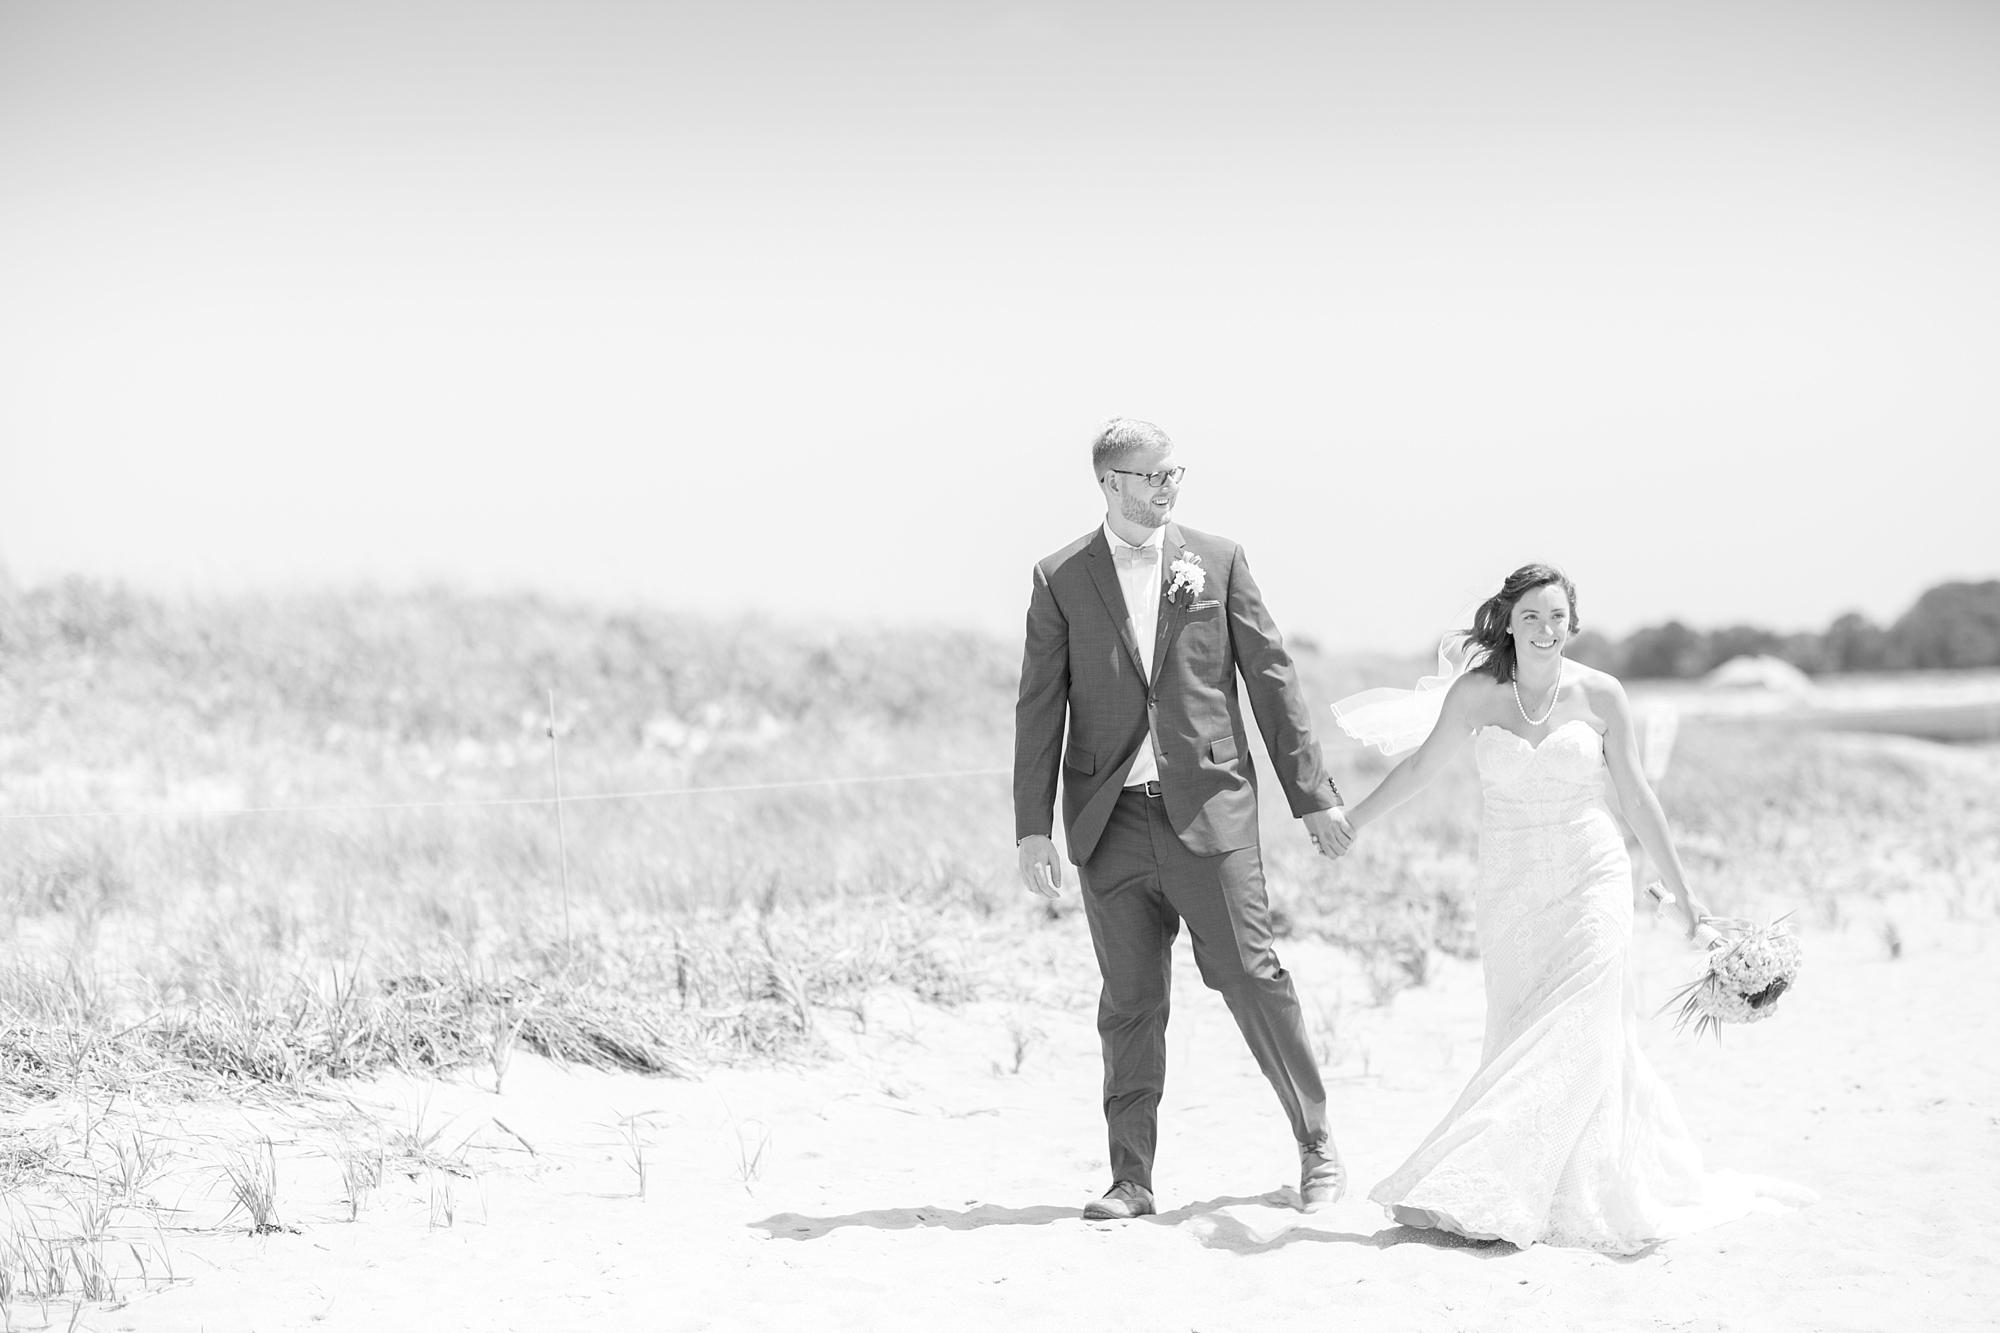 Goodman 3-Bride & Groom Portraits-250_anna grace photography wellfleet cape cod massachusetts destination wedding photographer Chequessett Yacht and Country Club wedding photo.jpg